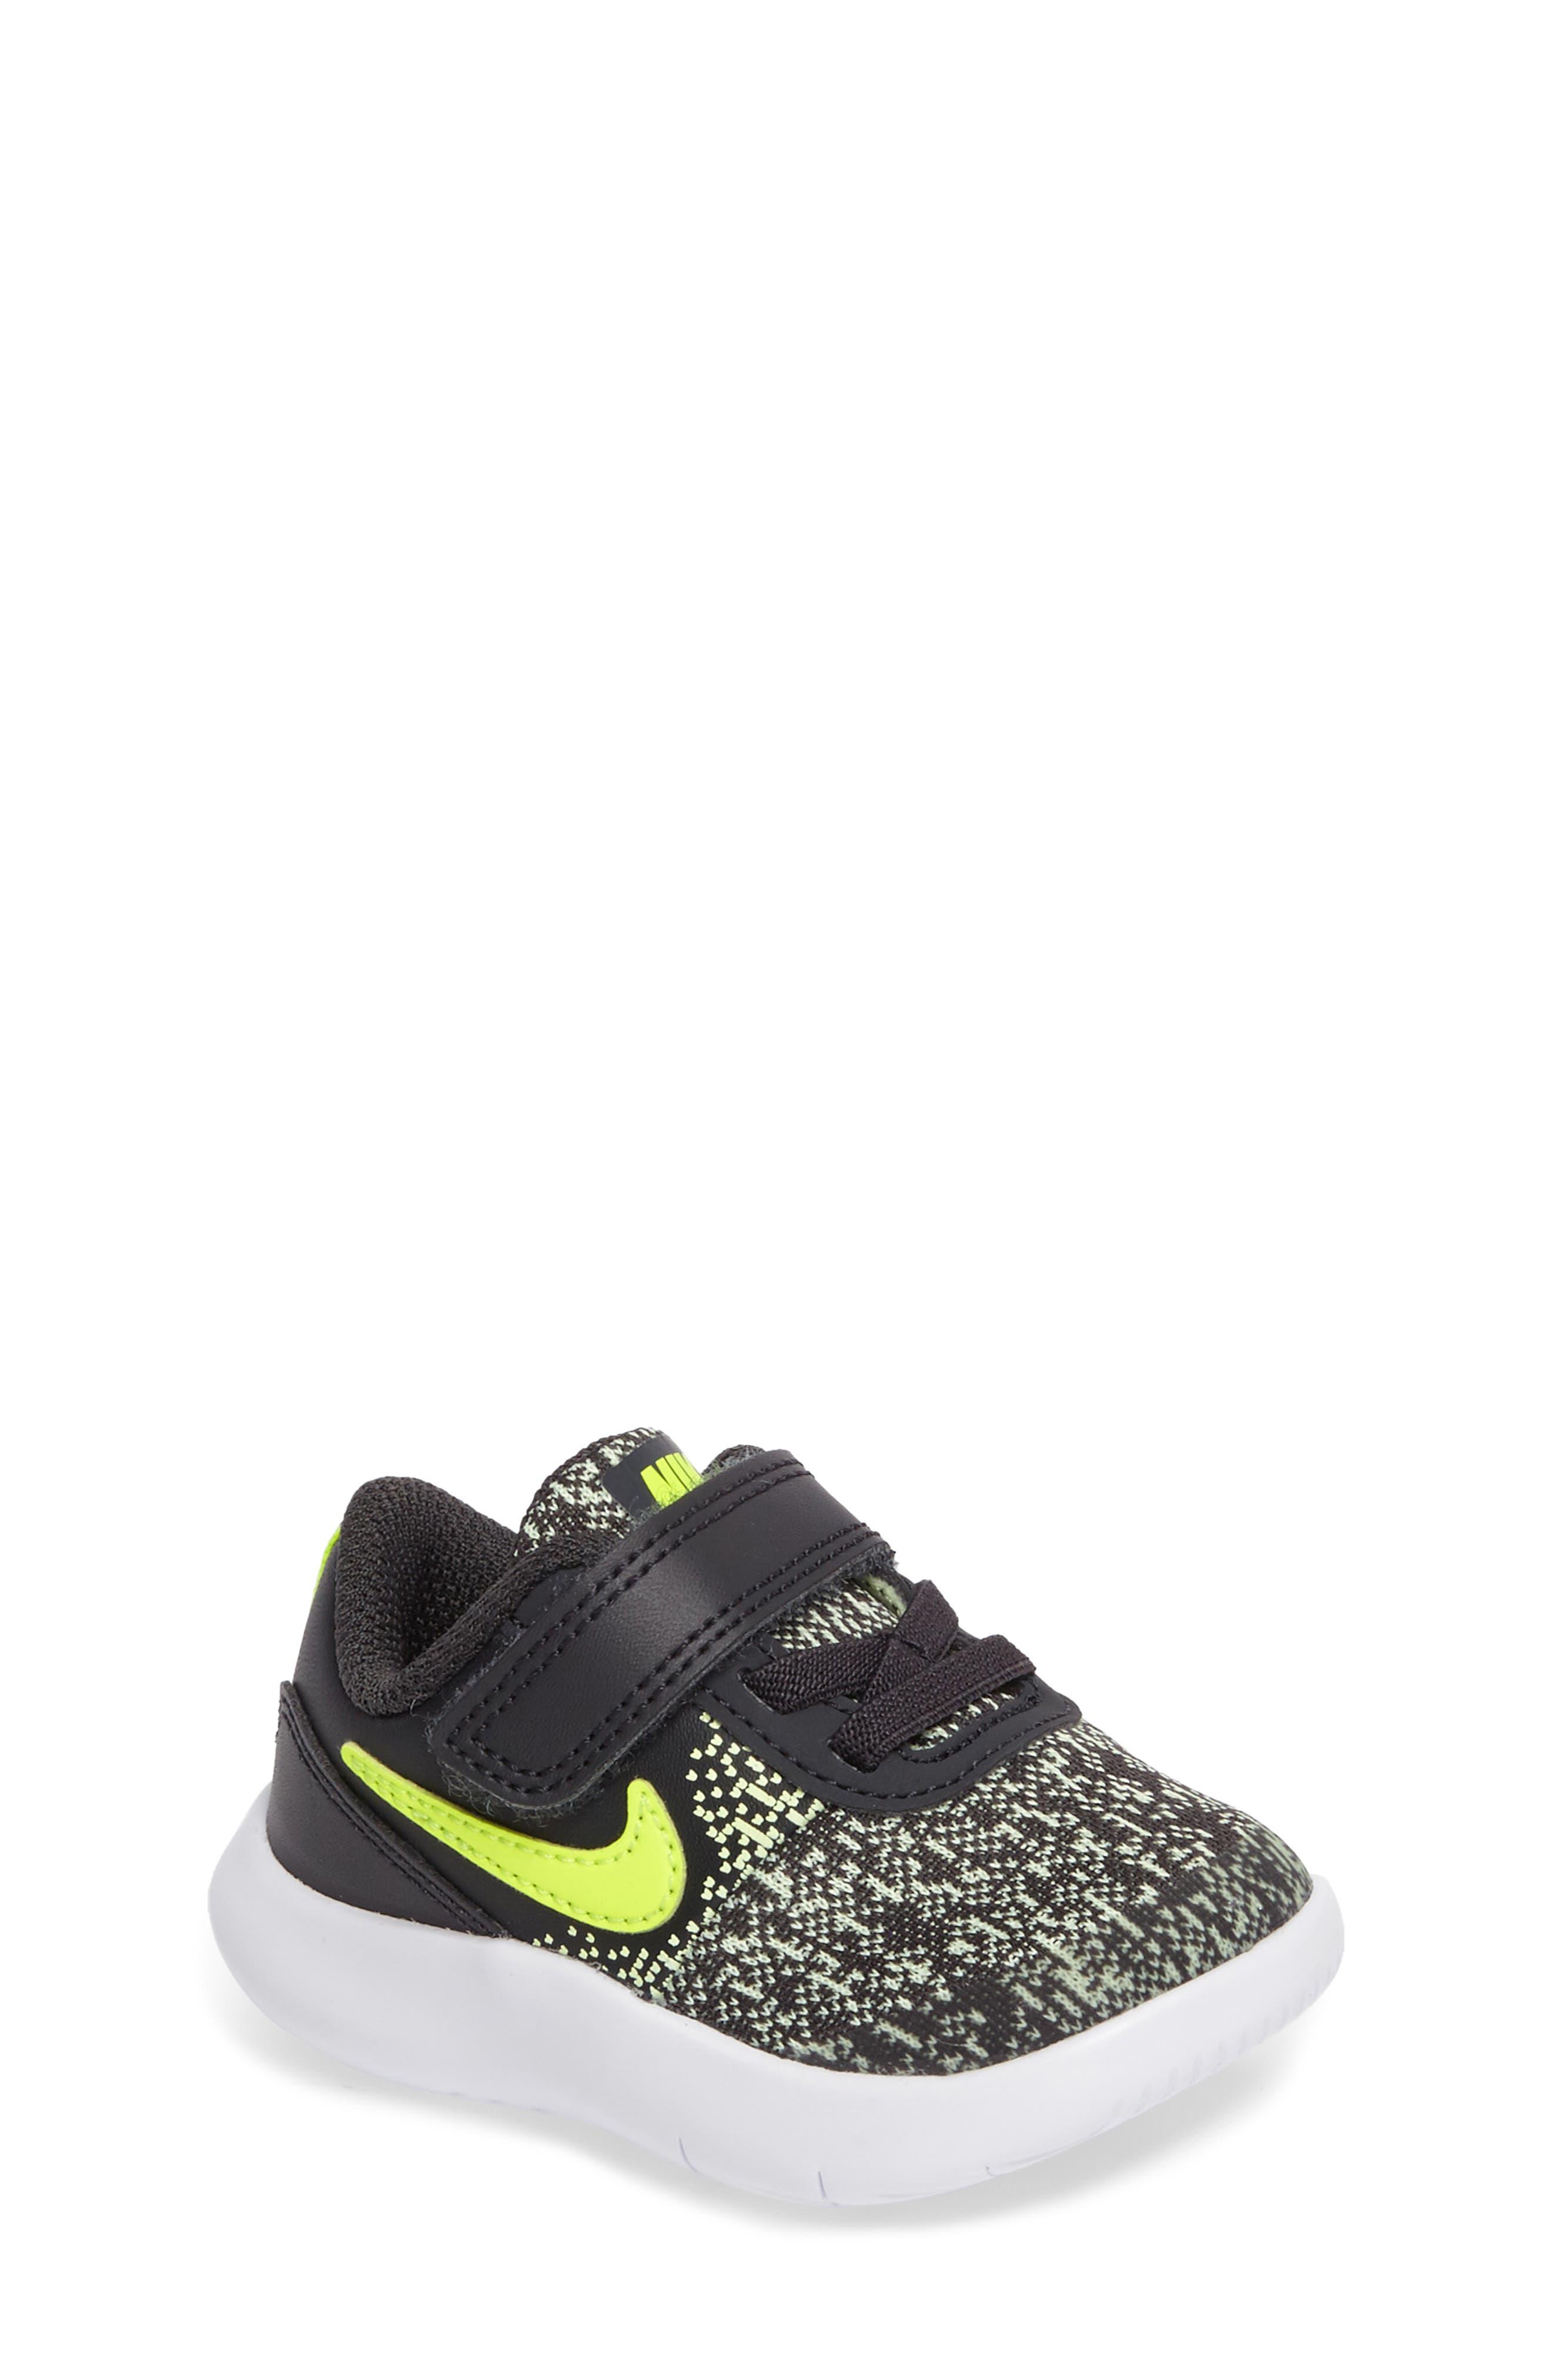 Flex Contact Sneaker,                         Main,                         color,